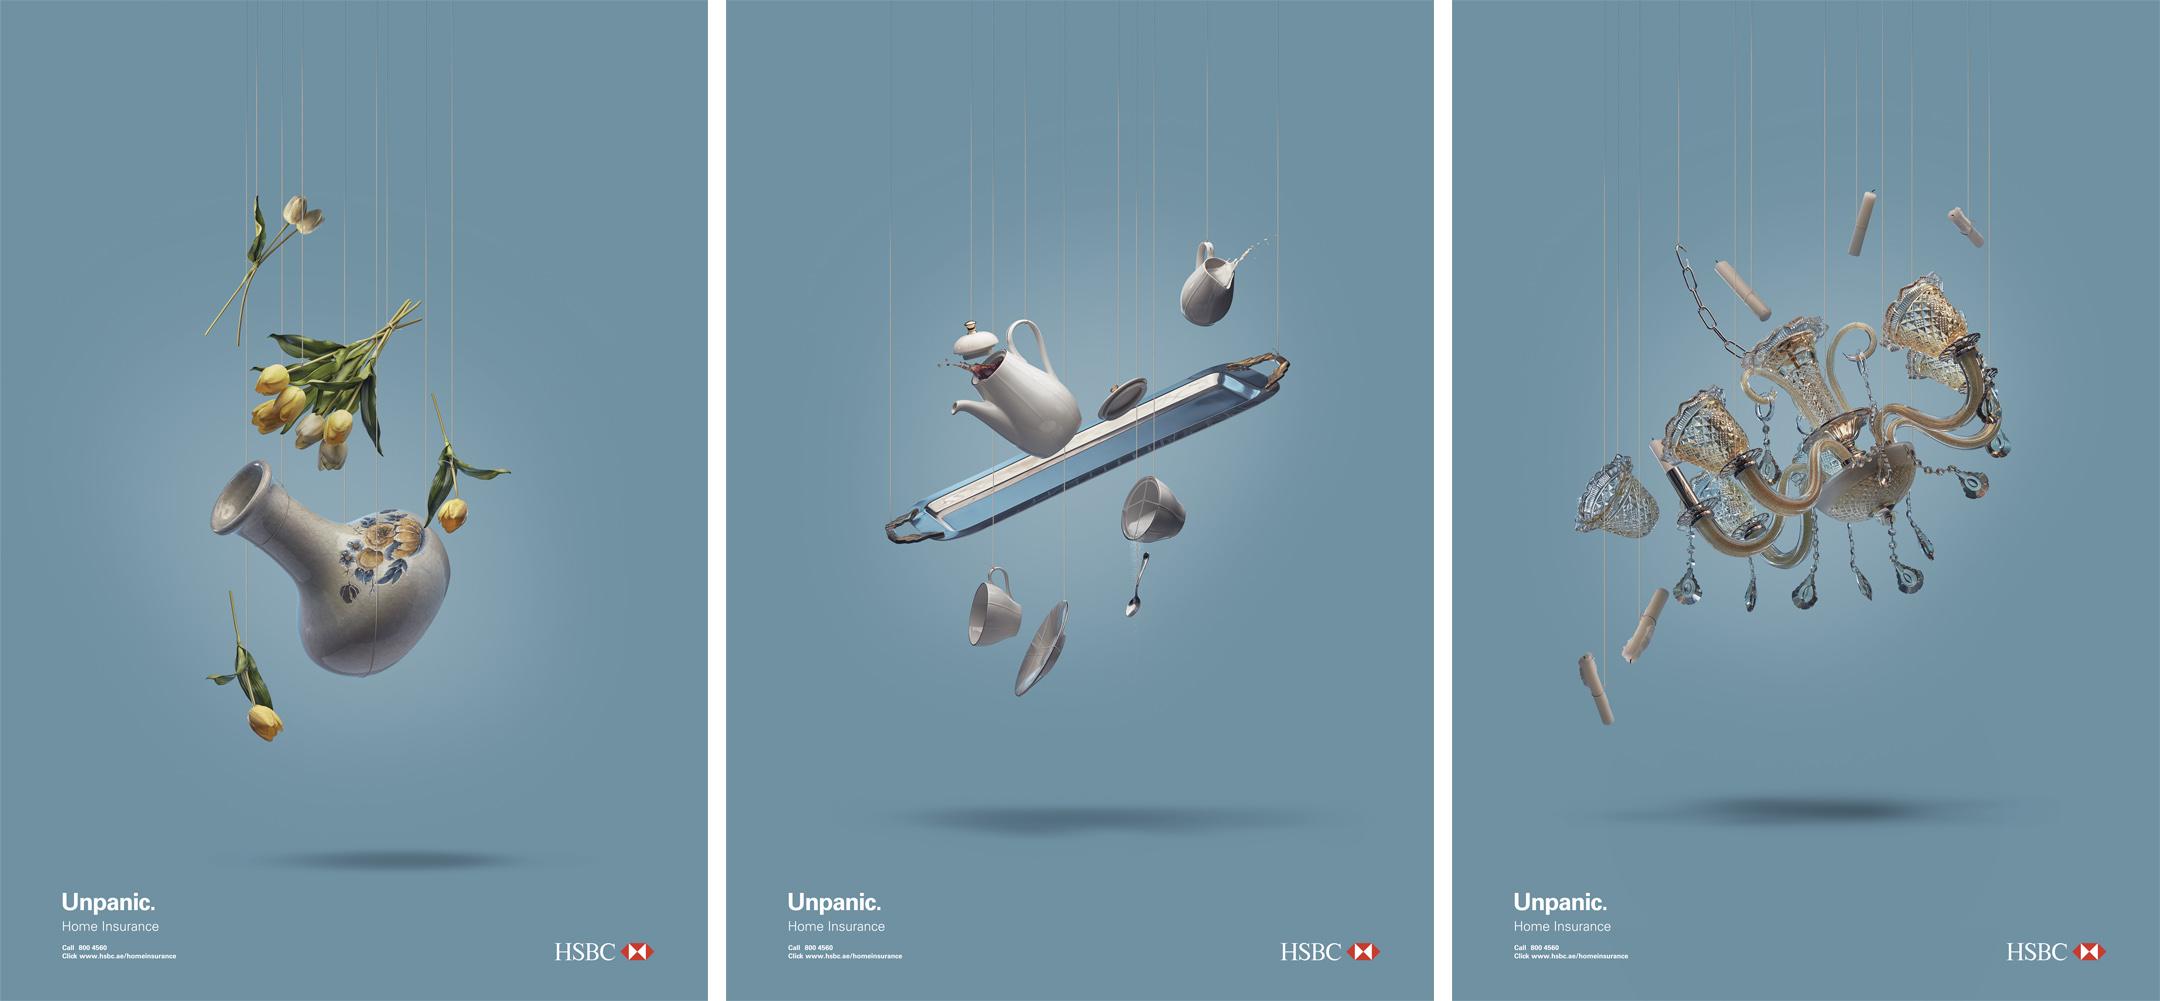 HSBC Unpanic Campaign